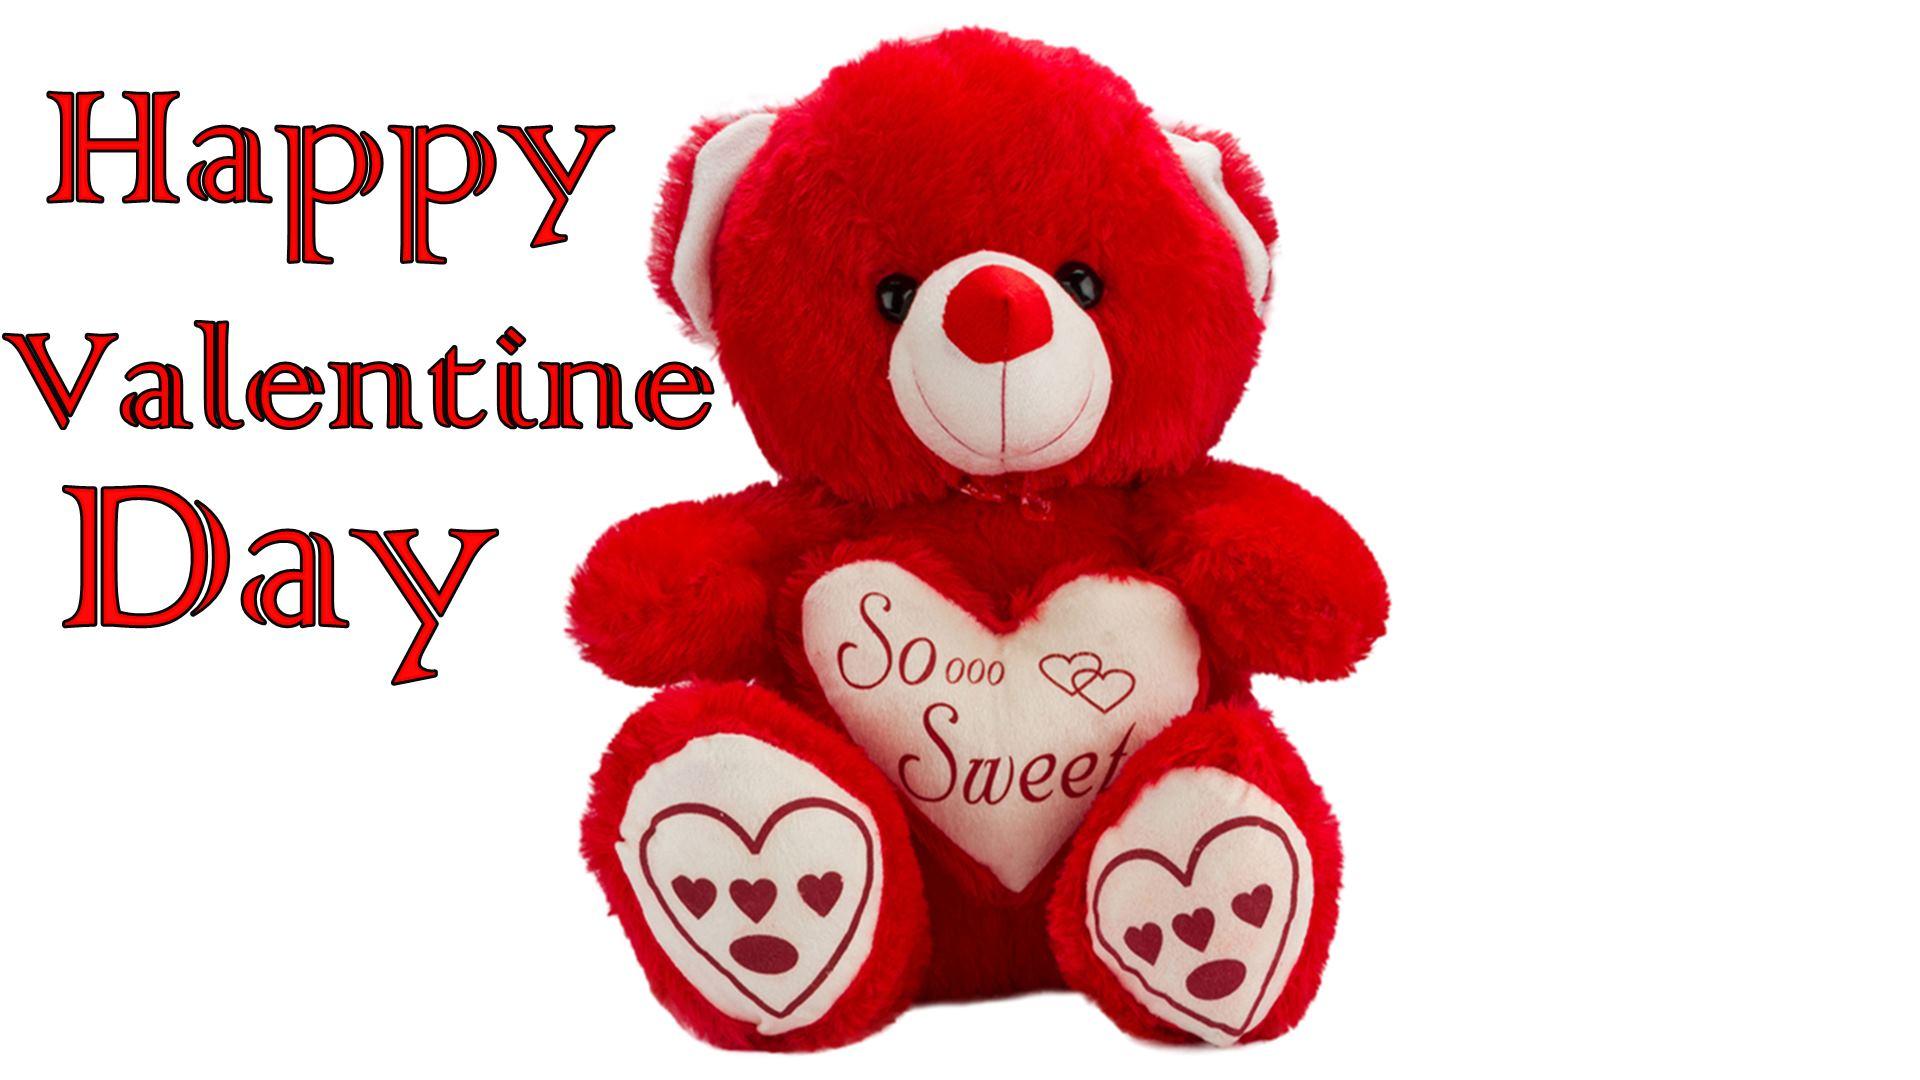 Teddy Bear Fiancee Wishing Valentine 2016 Images